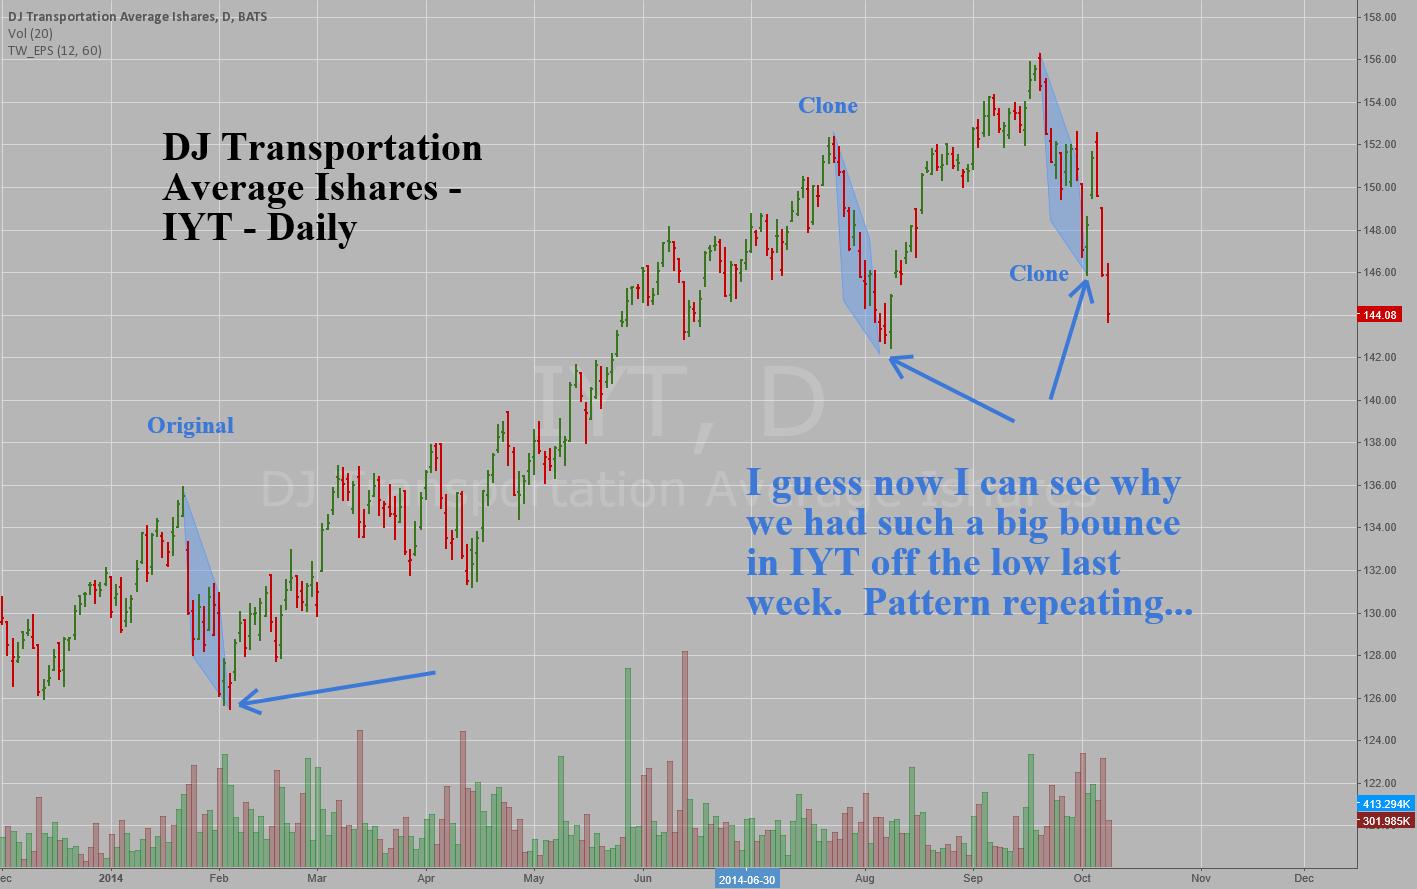 DJ Transportation Average Ishares - IYT - Daily - Cloned Decline